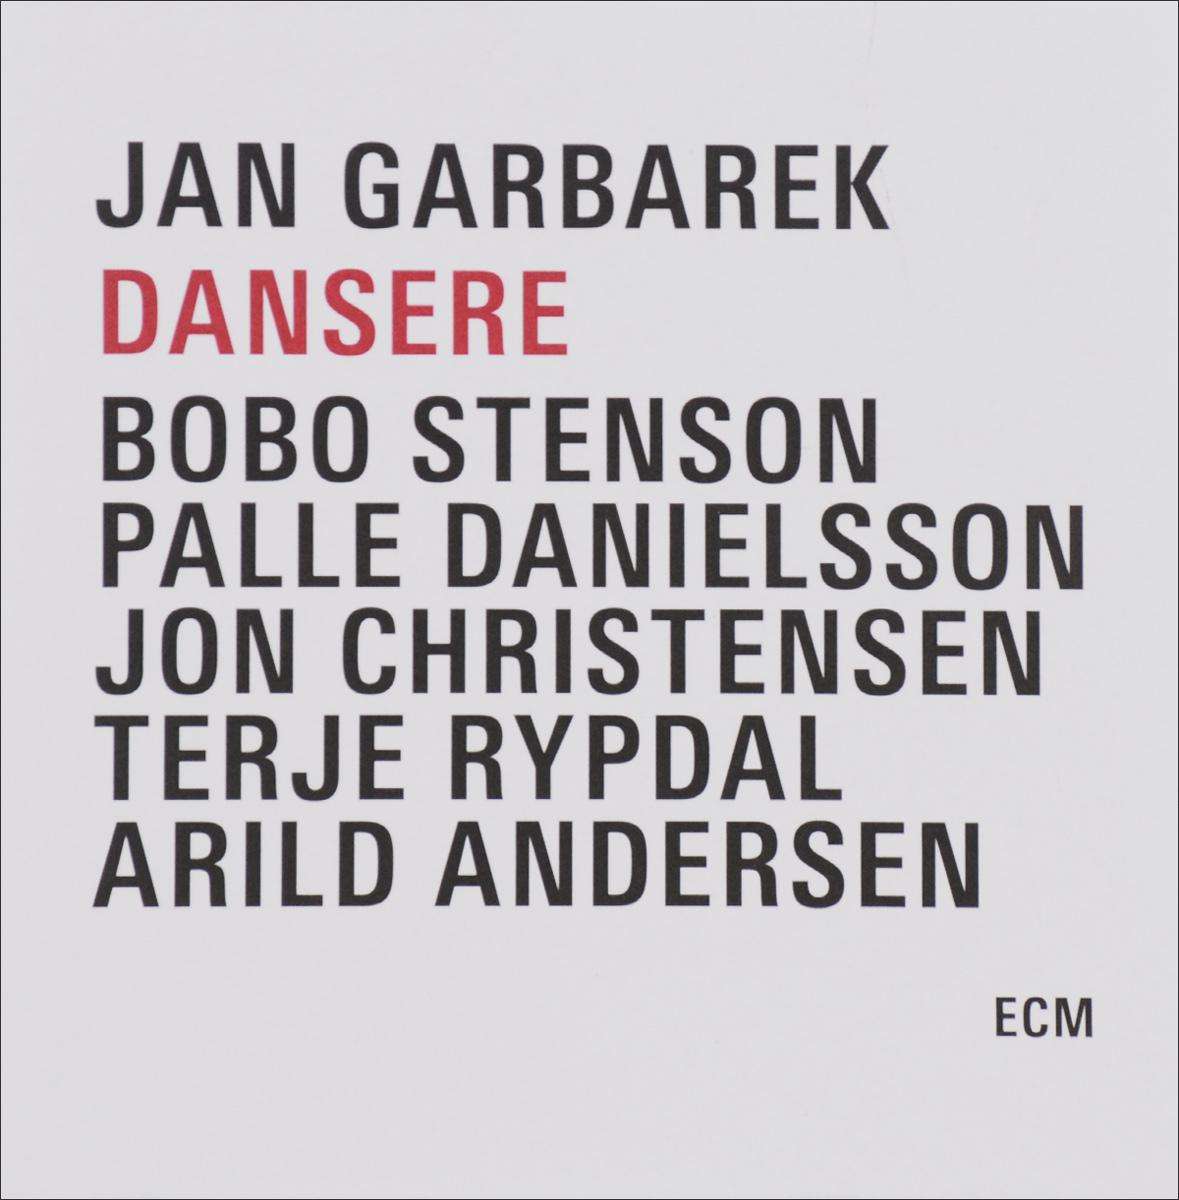 Ян Гарбарек,Бобо Стенсон,Терджи Рипдал,Эйрилд Андерсен,Джон Кристенсен,Палл Даниельсон Jan Garbarek. Dansere (3 CD) недорого